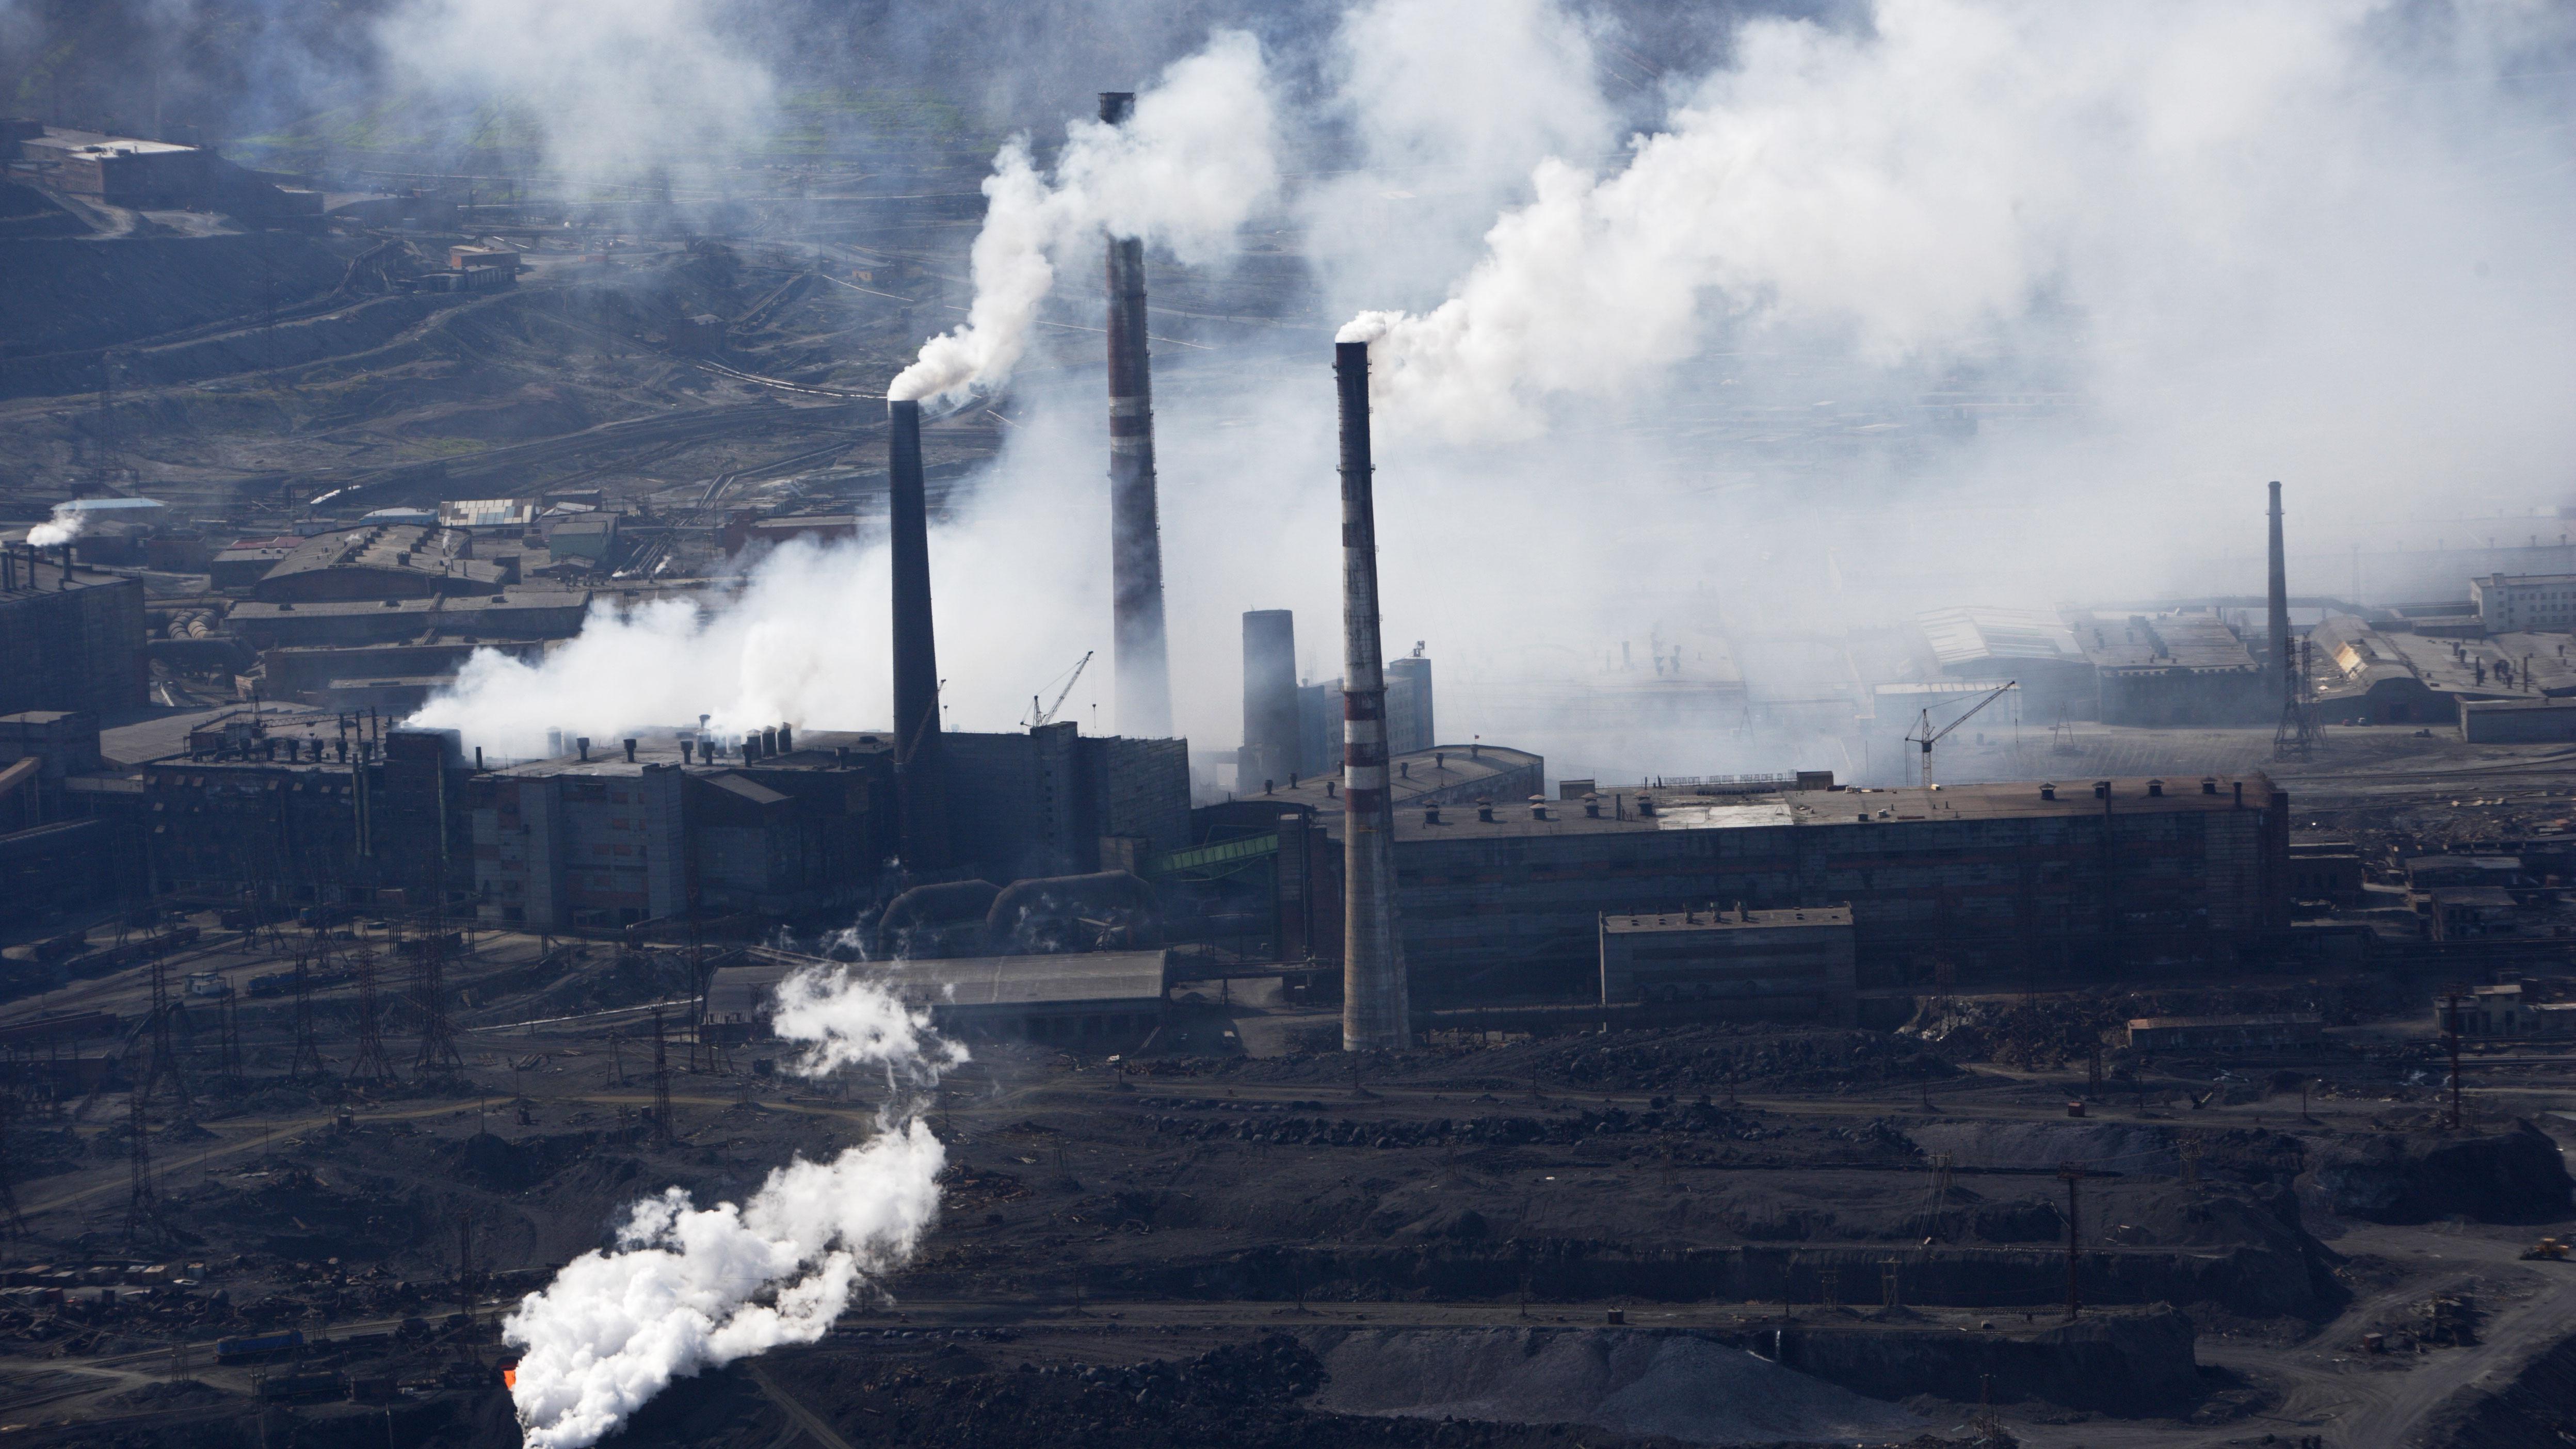 Спасателей направили в Норильск для ликвидации последствий разлива топлива на ТЭЦ